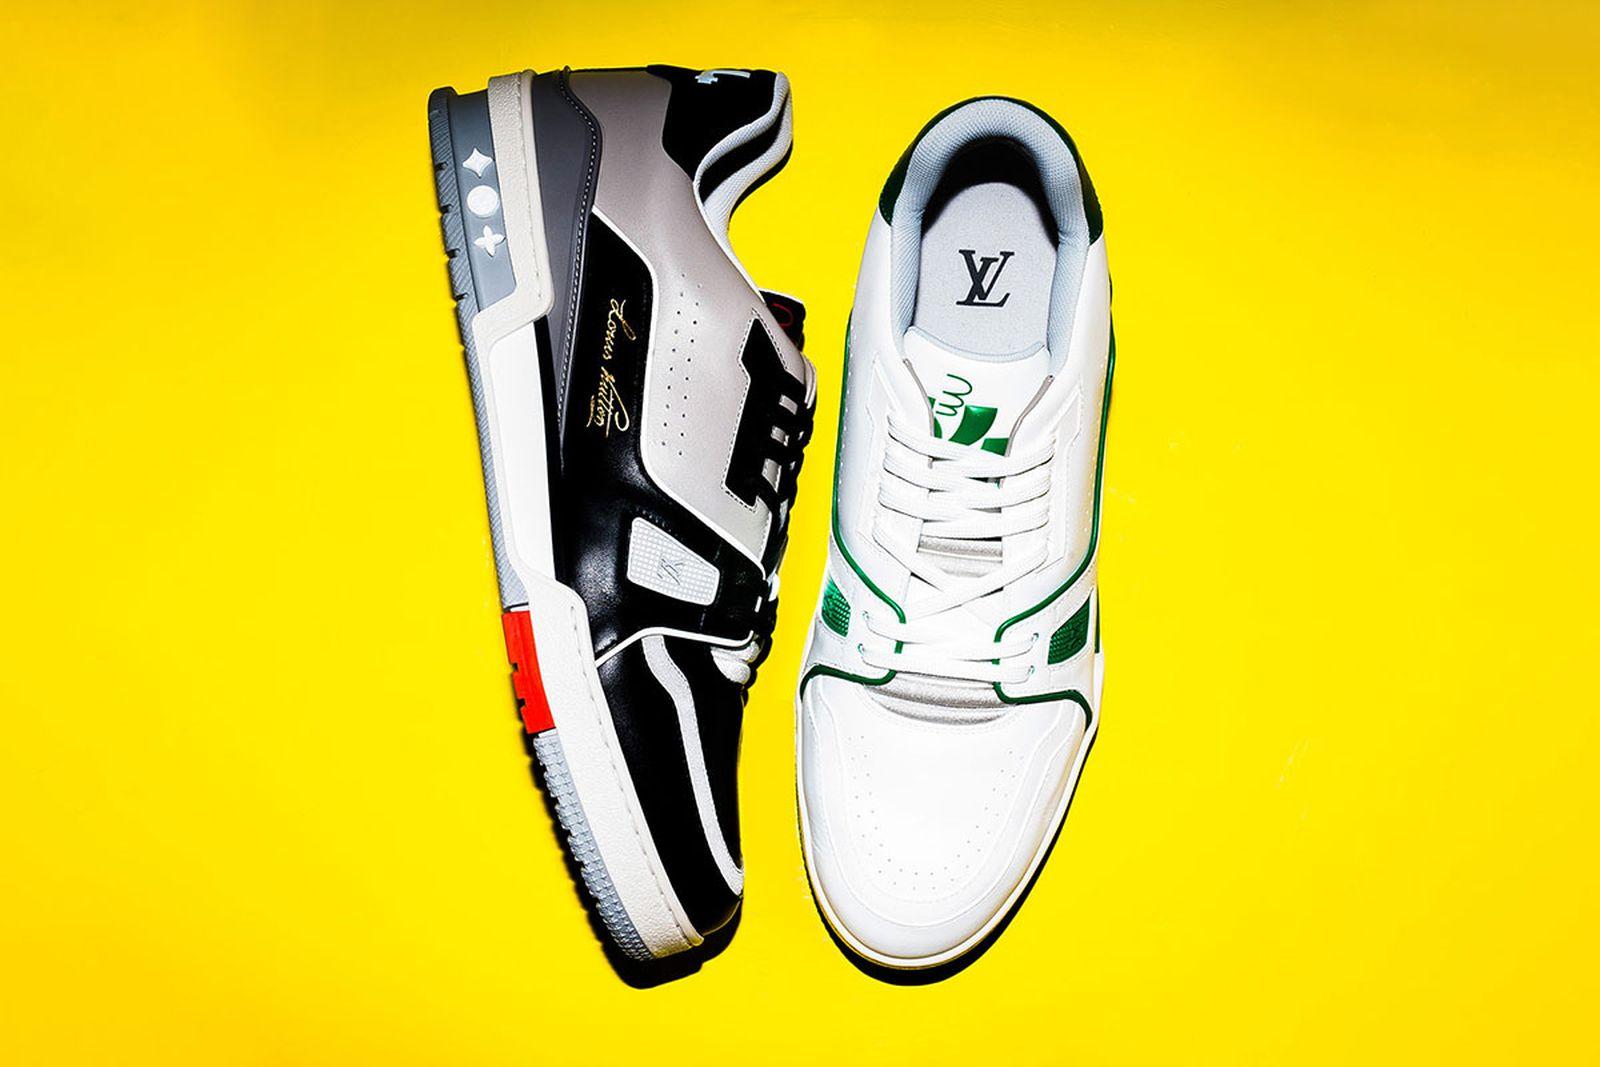 luxury sneaker value louis vuitton lead designer sneakers virgil abloh